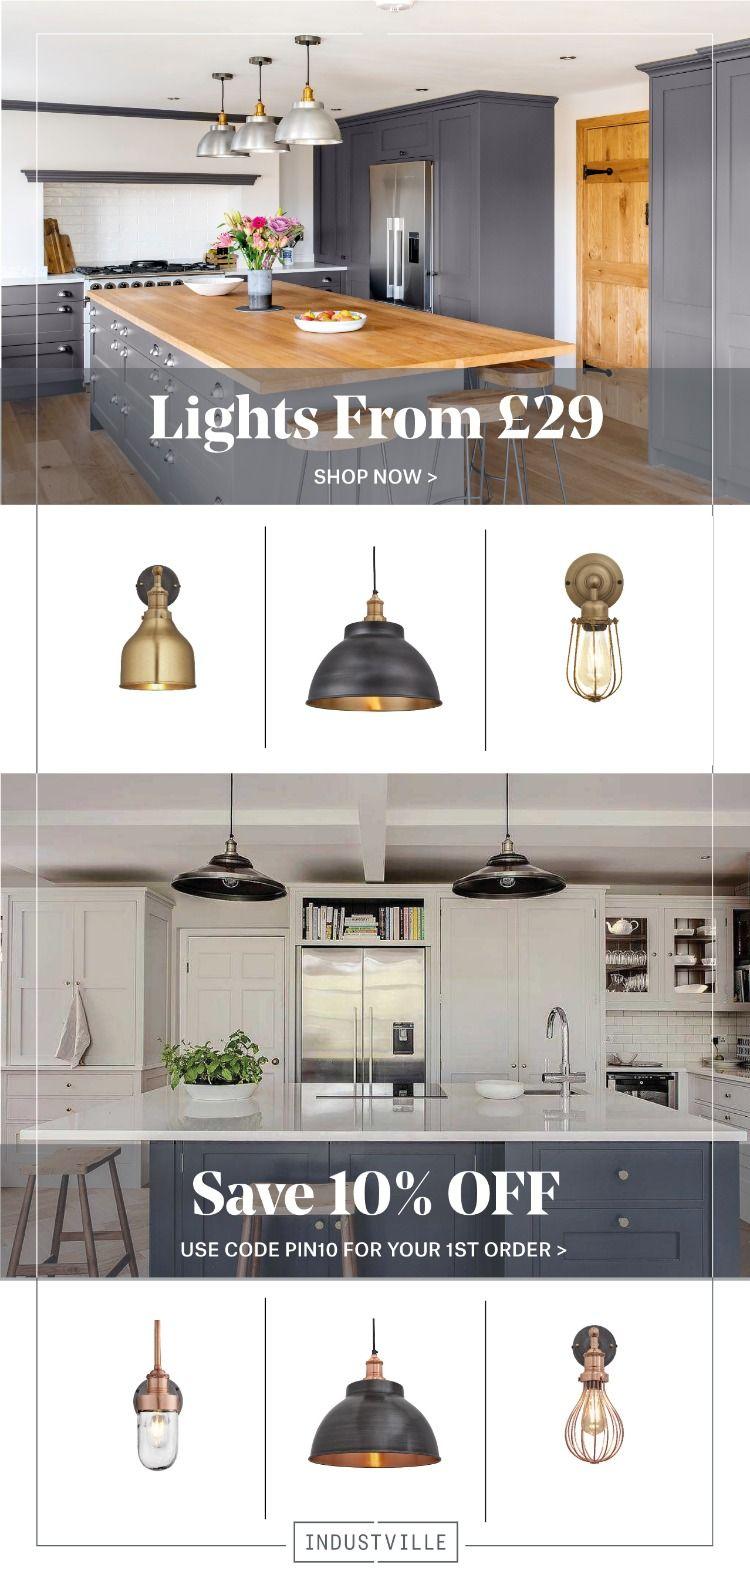 Save 10 On First Industville Order Retro Lighting Industrial